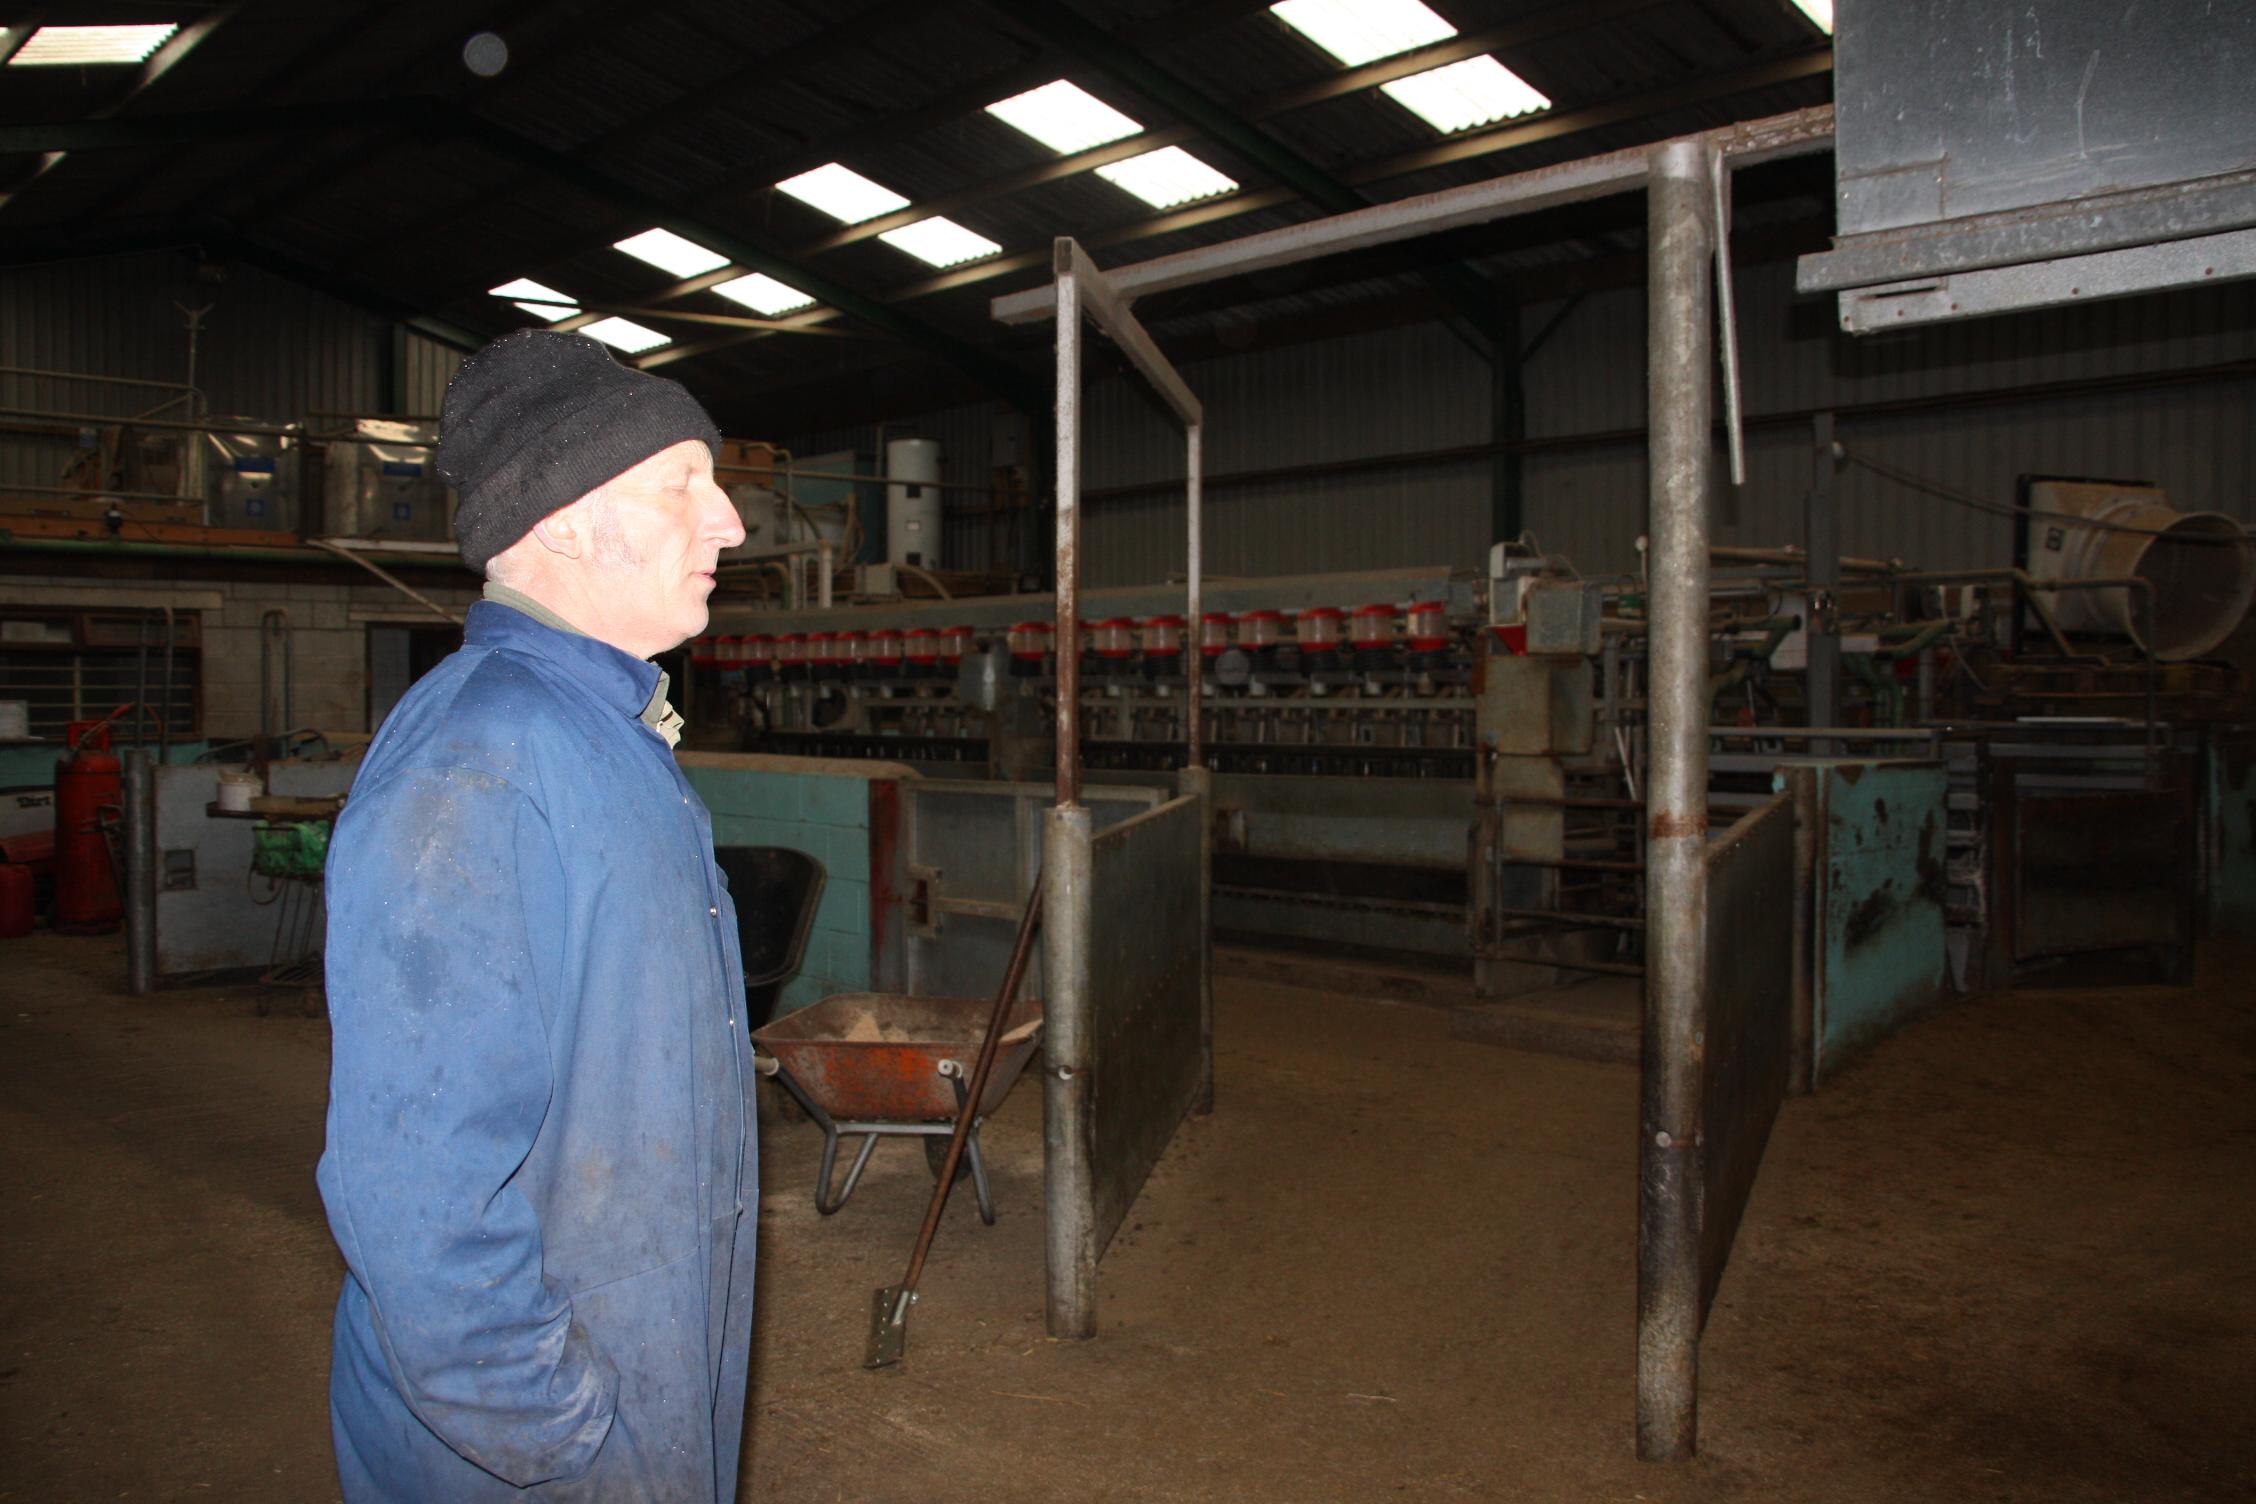 Farmer John on his farm tour at the Dandelion Hideaway